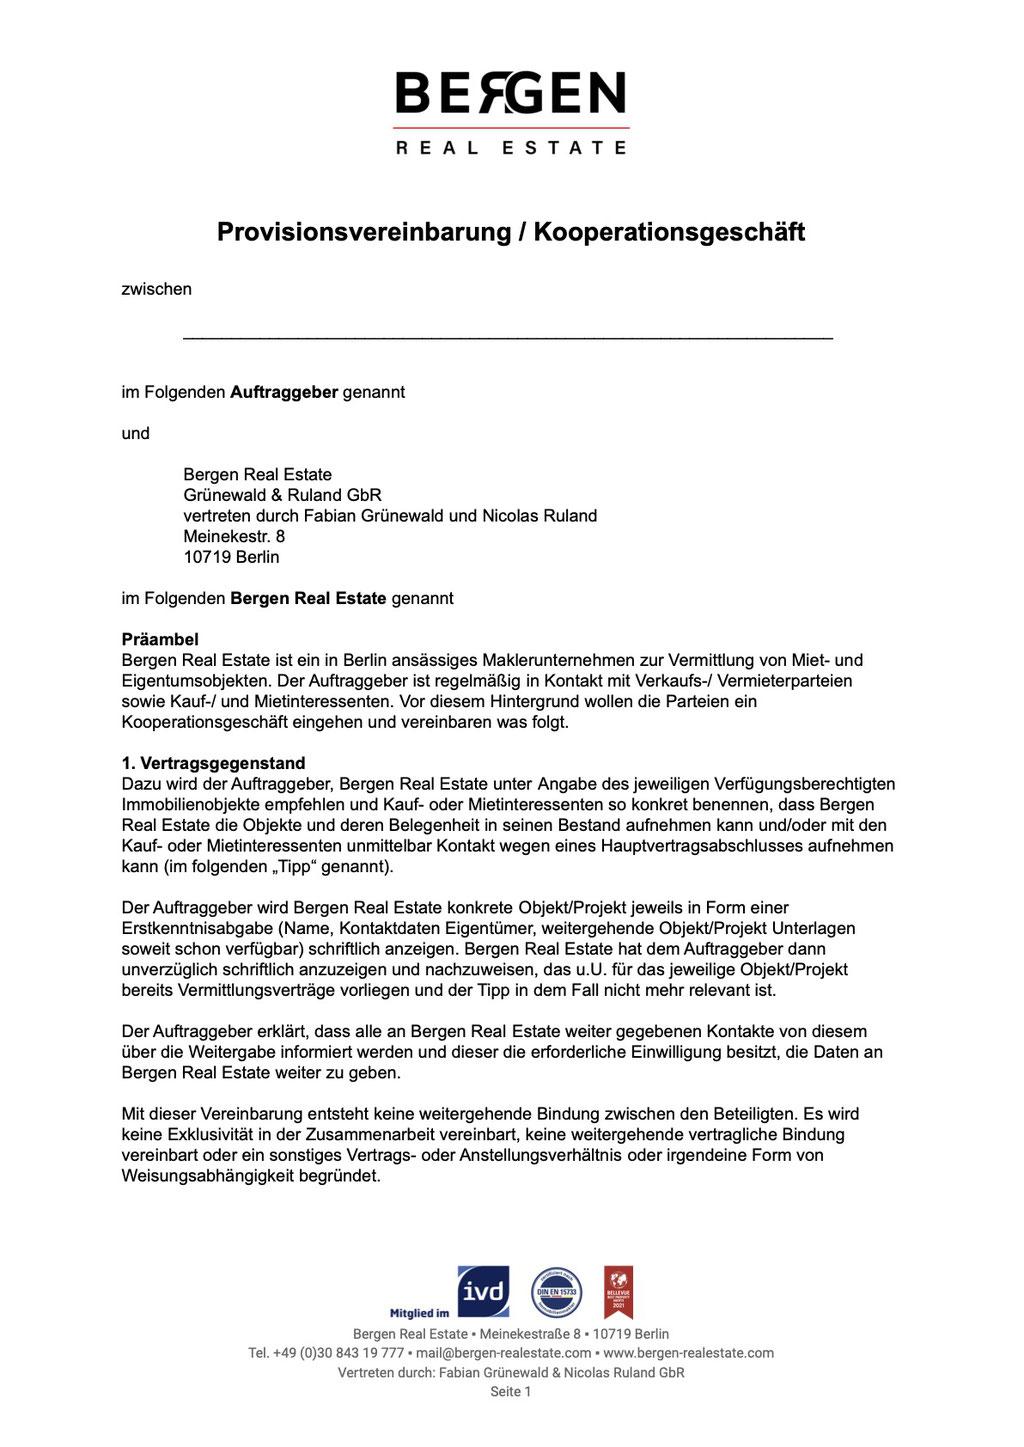 Tippgebervereinbarung Provision Muster